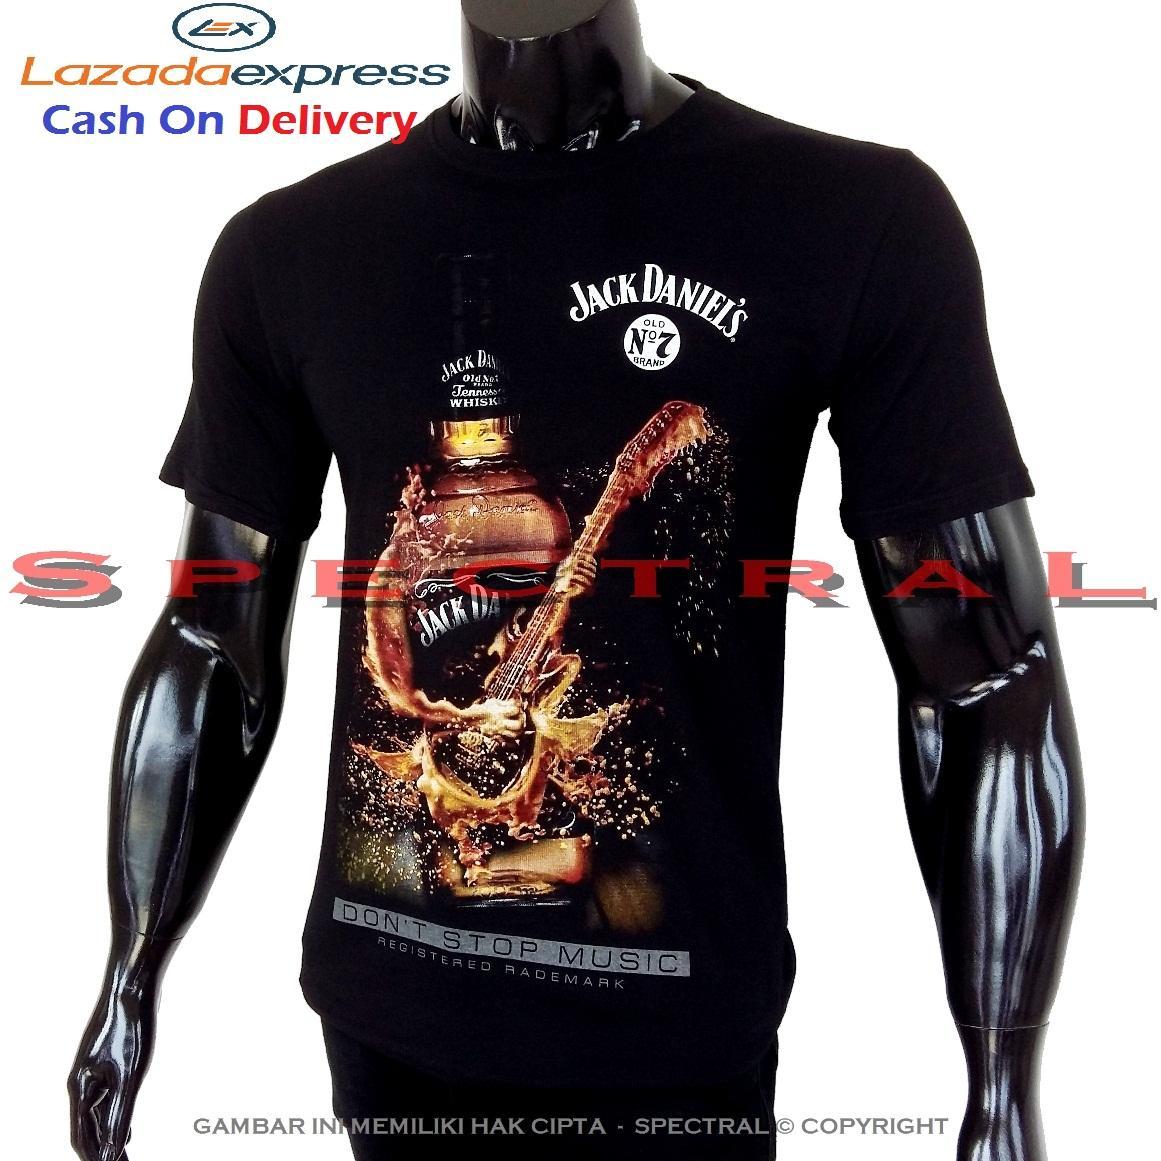 Spectral - GITAR MIRAS 100% Soft Cotton Combed 30s Kaos Distro Fashion T- Shirt